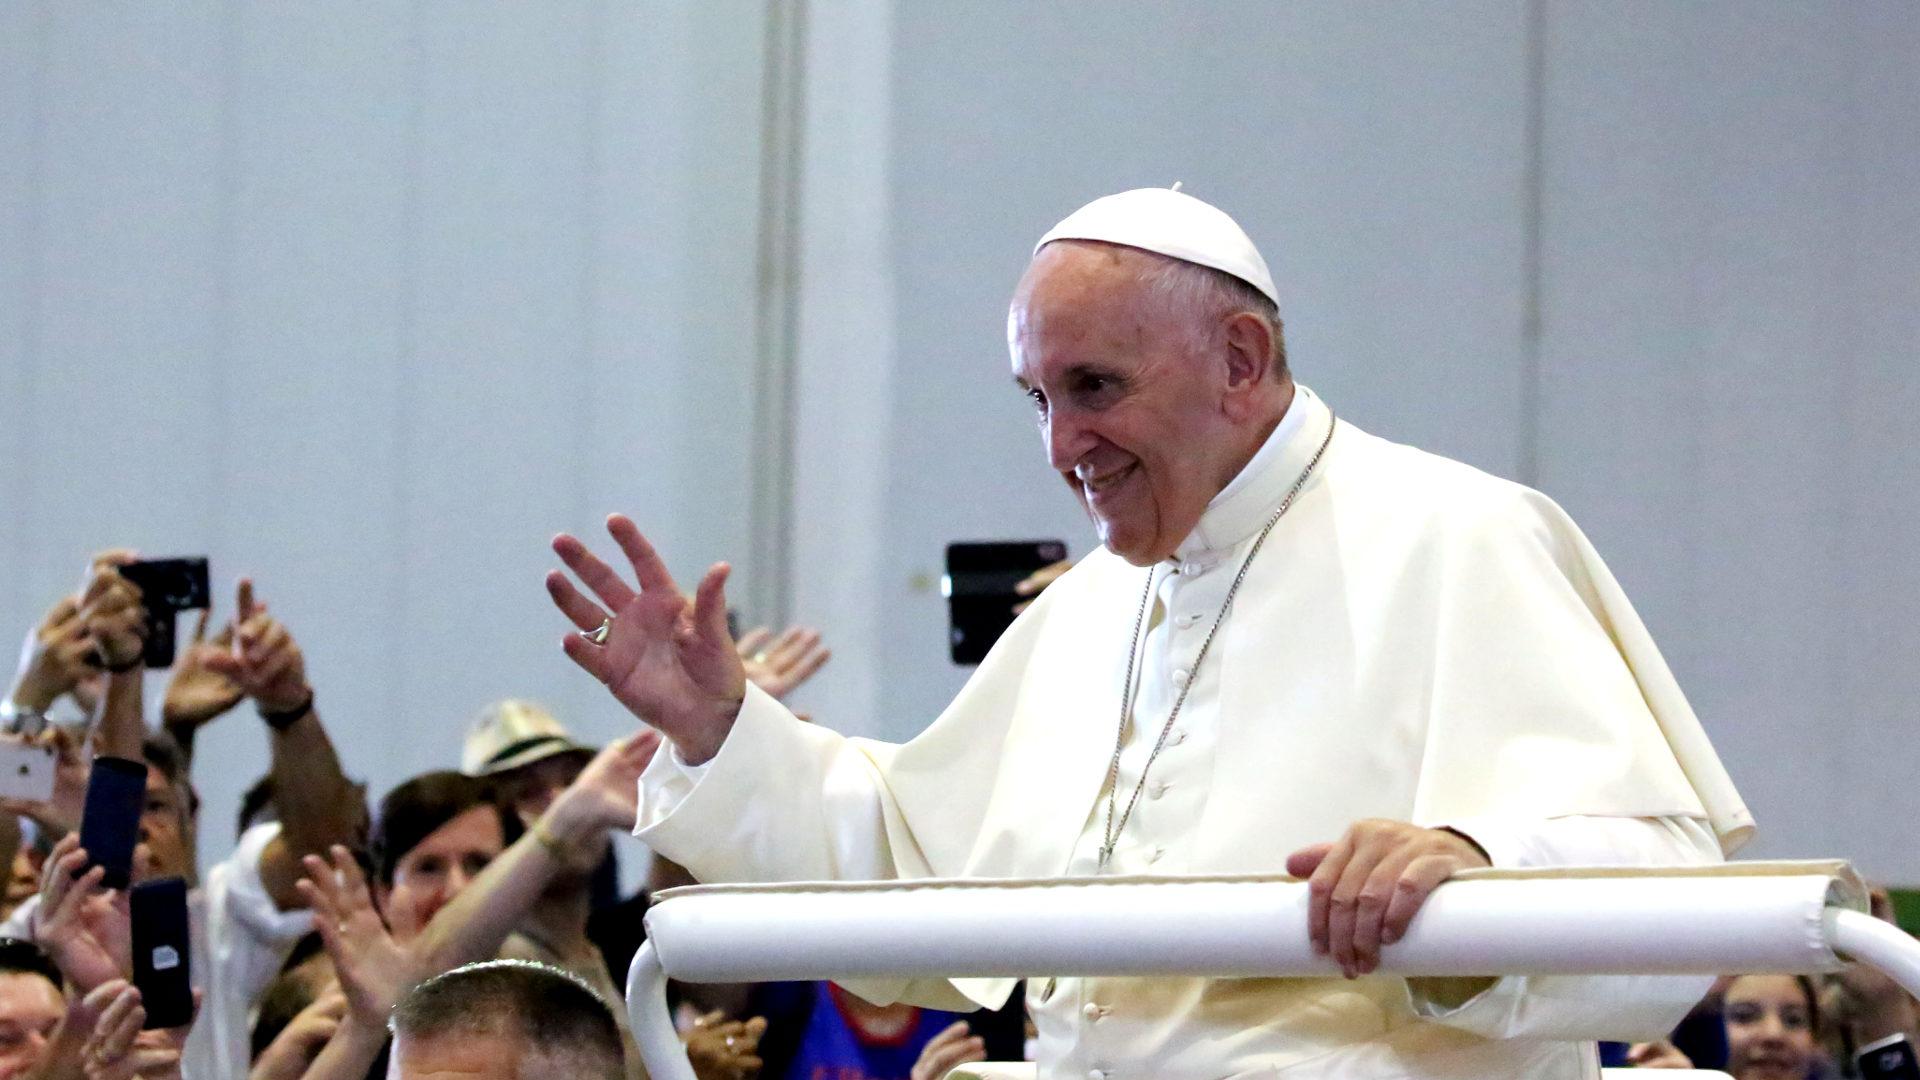 Papst Franziskus in Genf | © Bernard Hallet